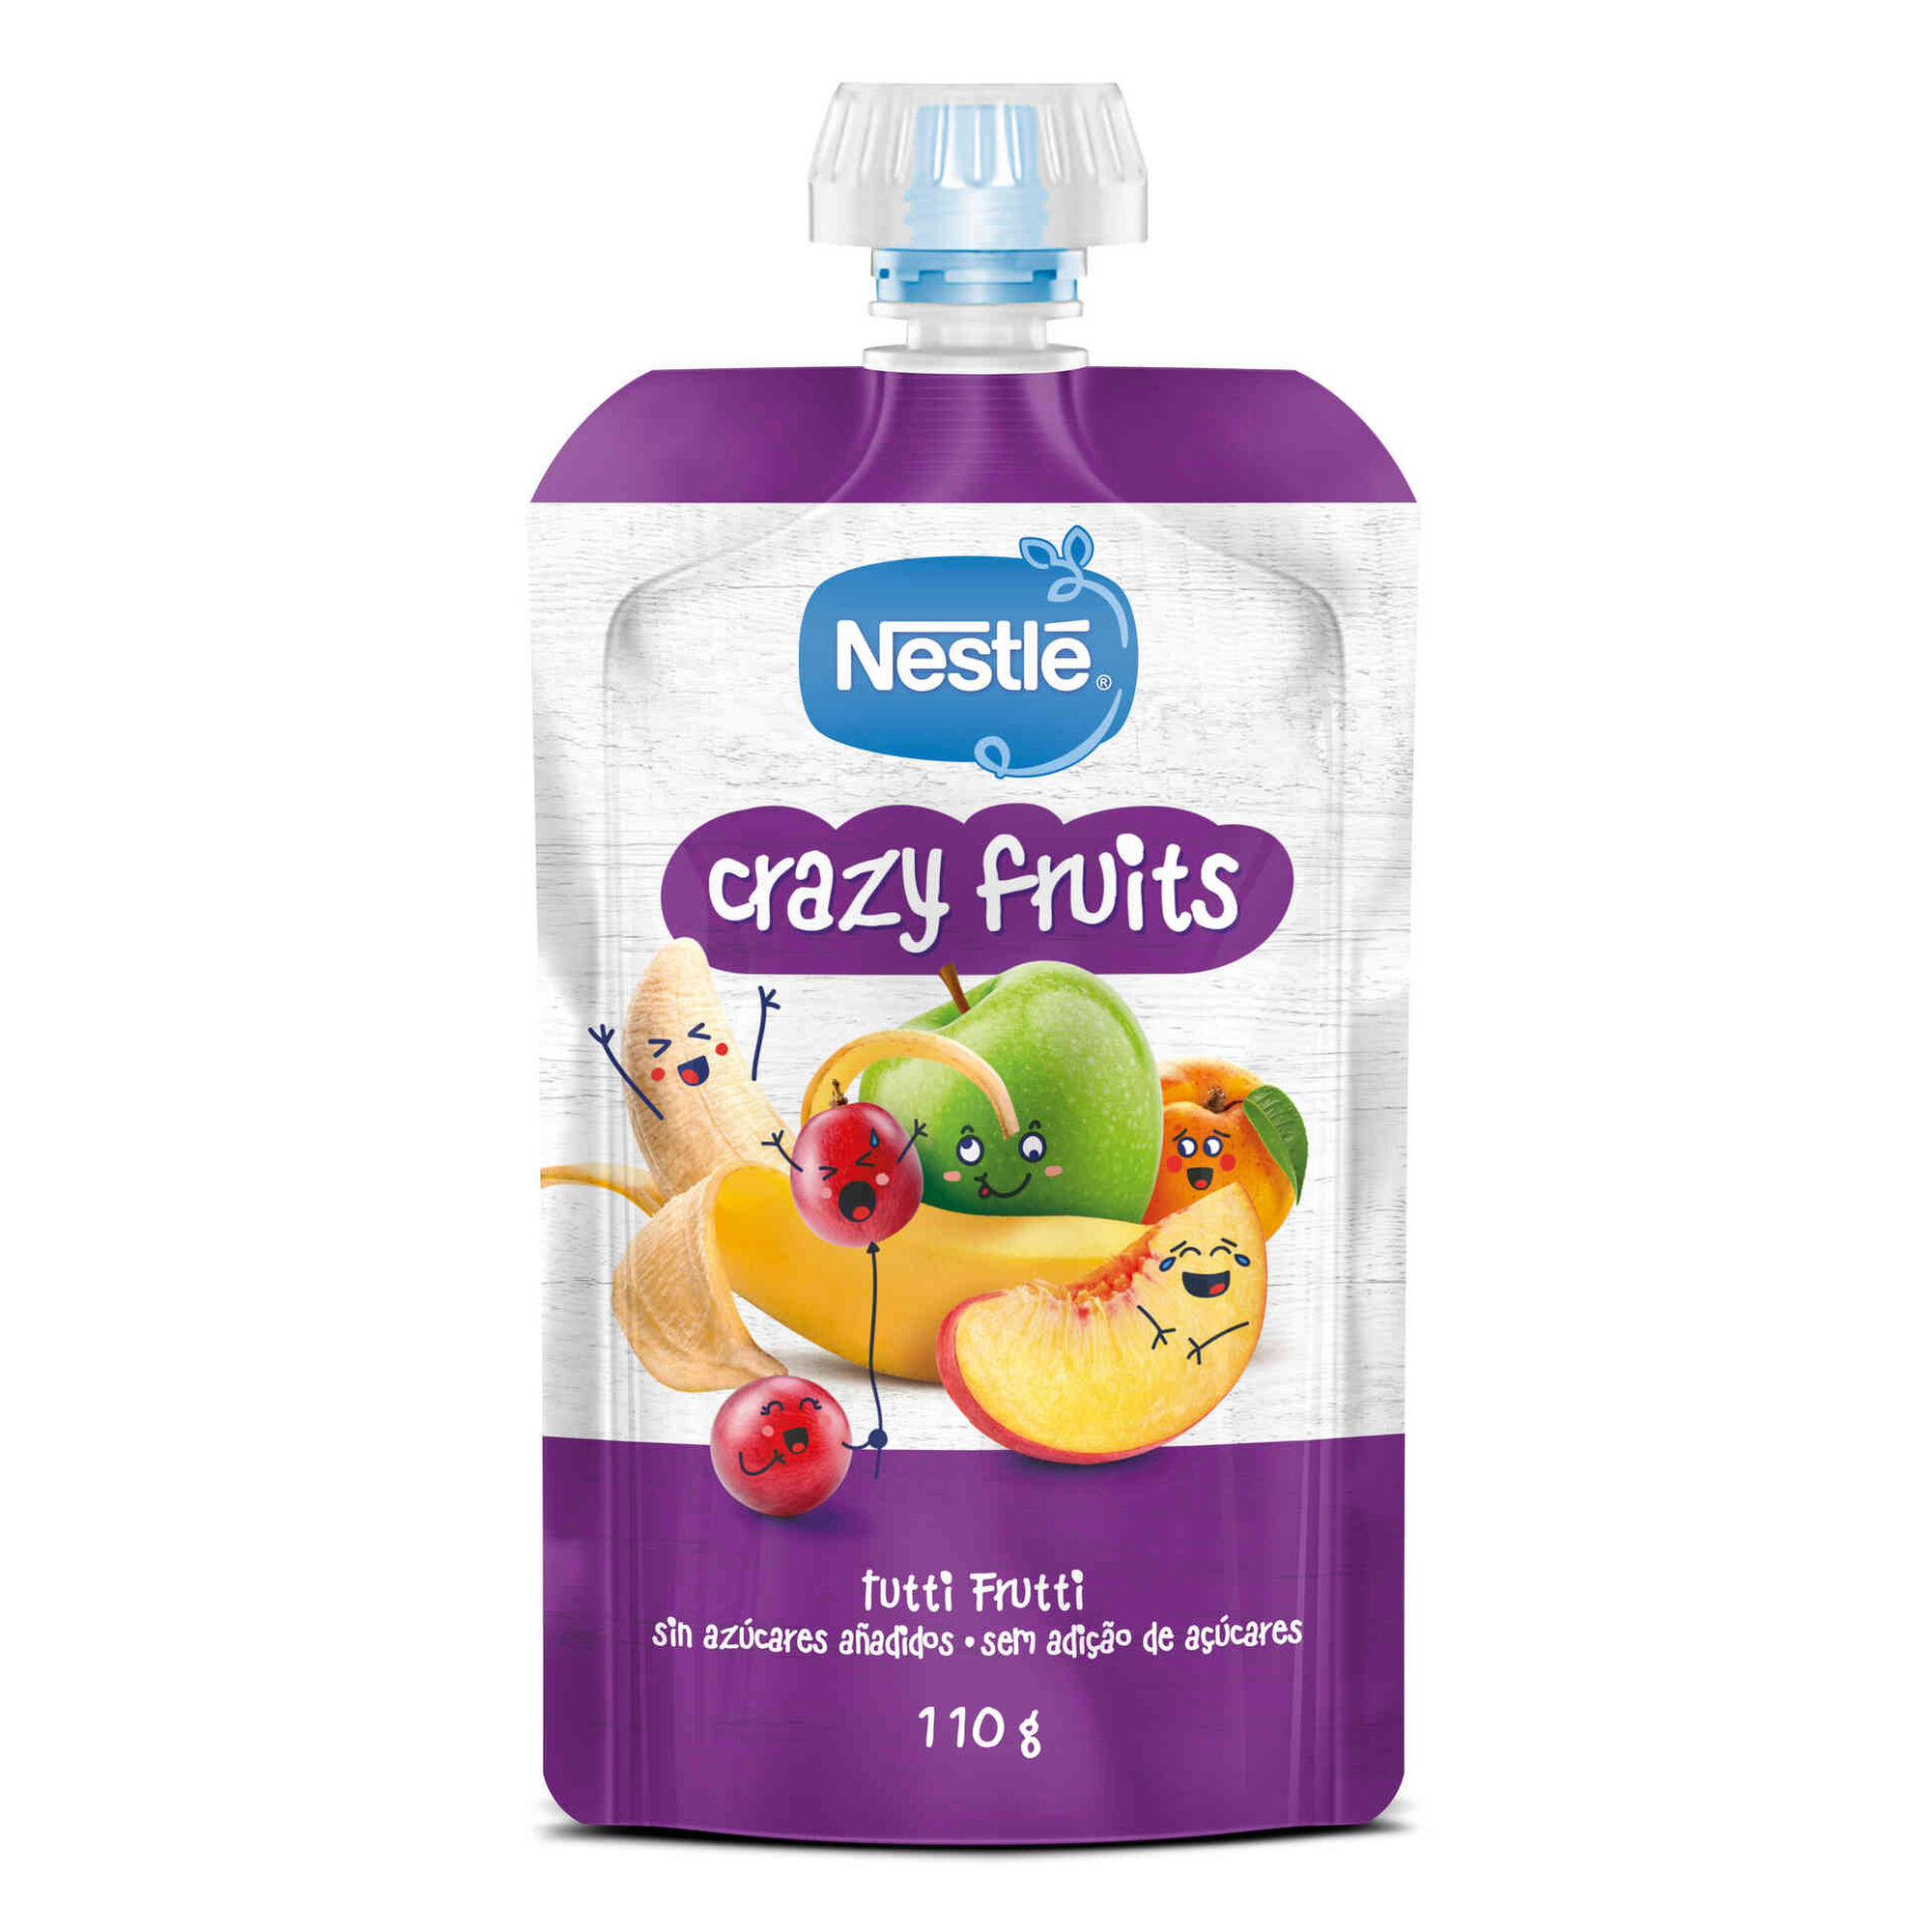 Saqueta de Fruta Tutti Frutti +12 Meses